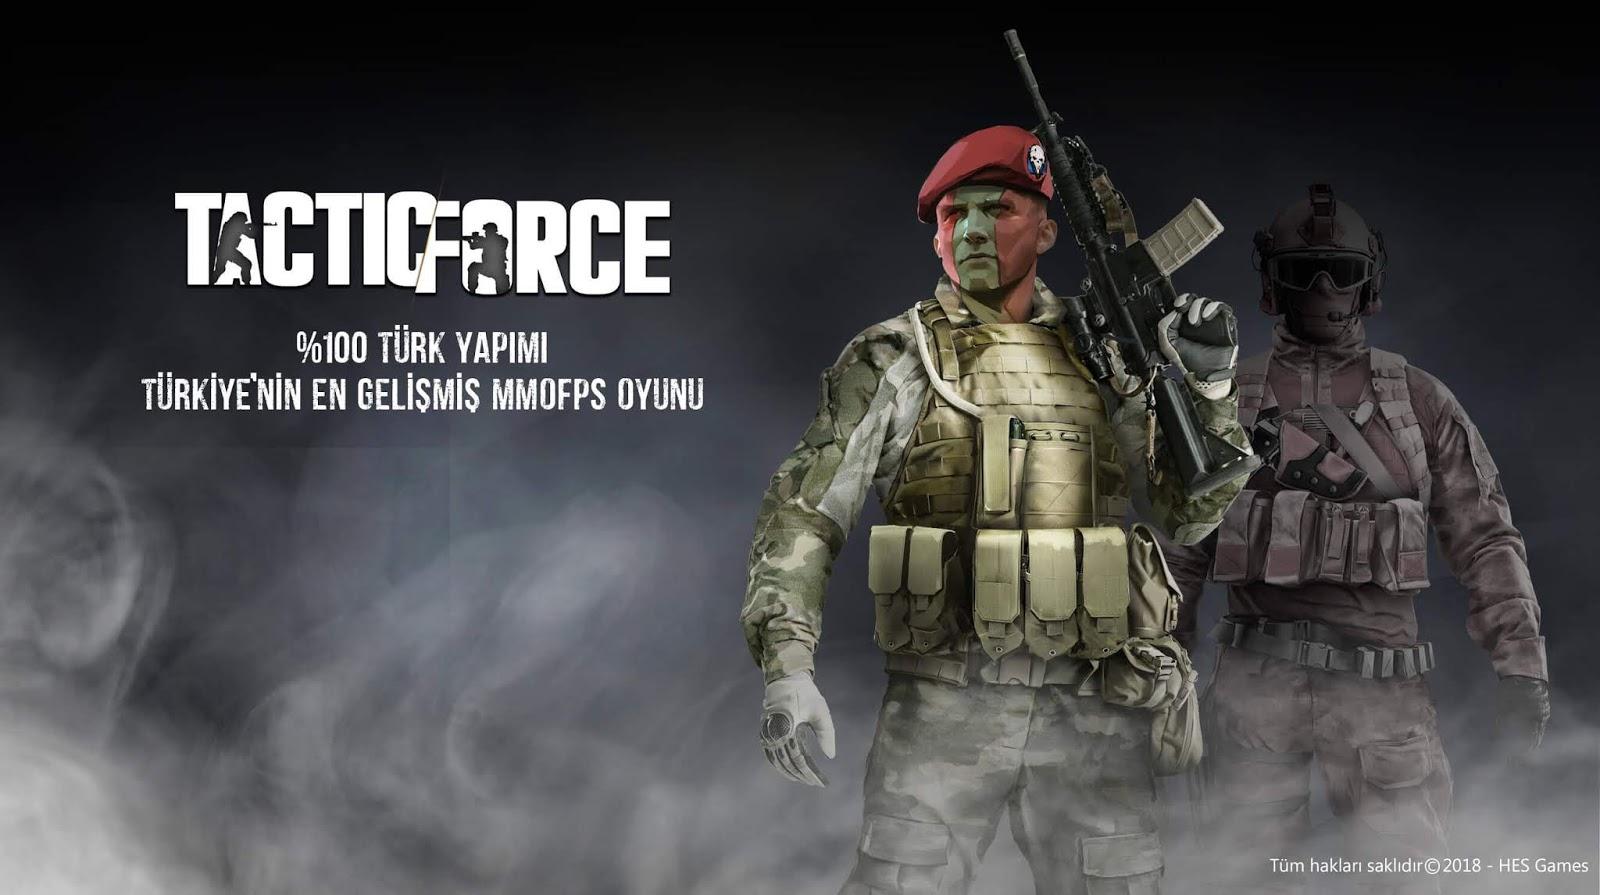 Tactic Force Gümbür Gümbür Geliyor!